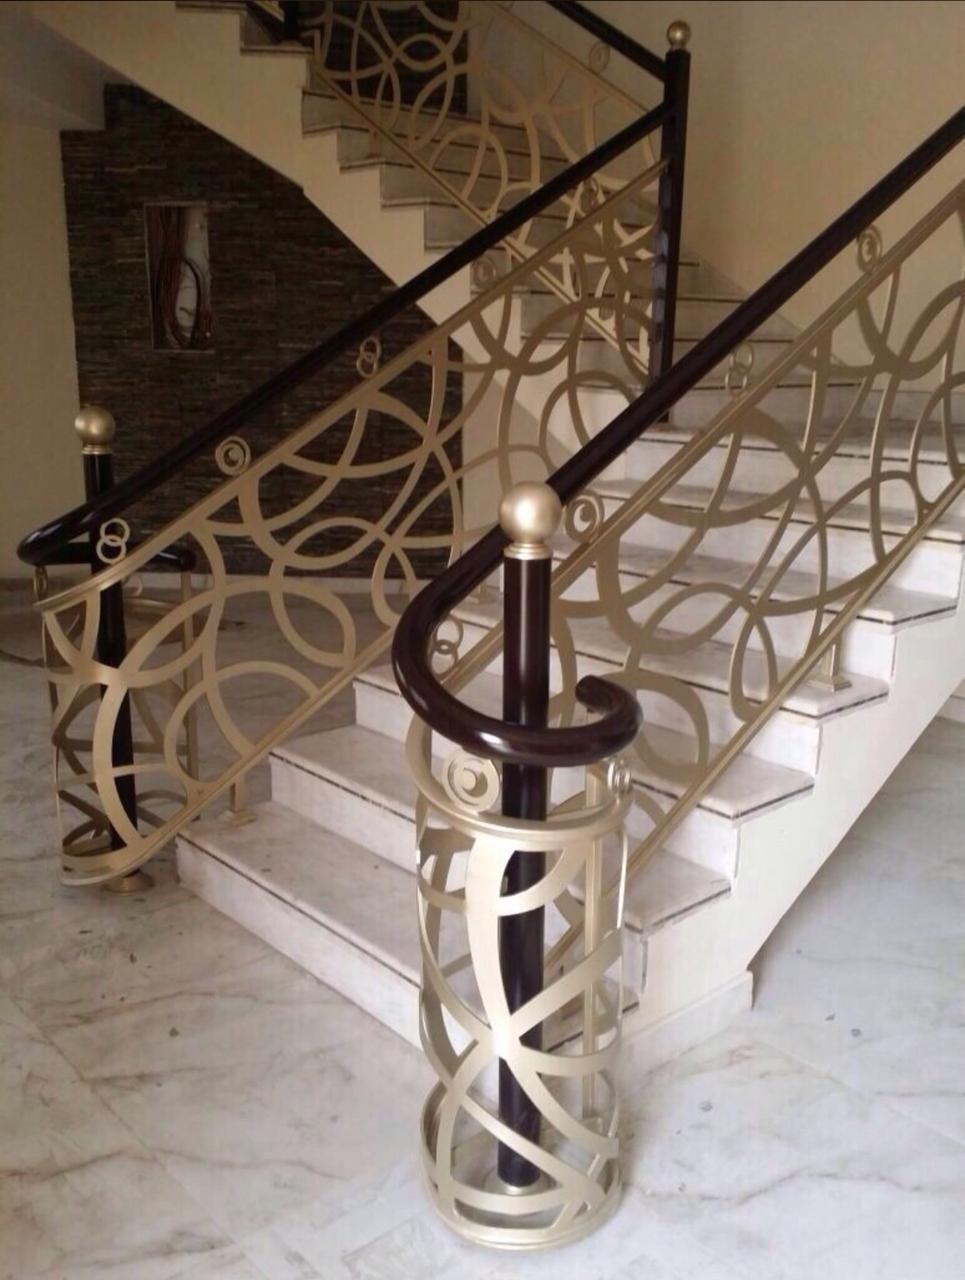 Pin By Alina Mosiu On درج داخلي Stairs Design Interior Staircase Interior Design Steel Railing Design